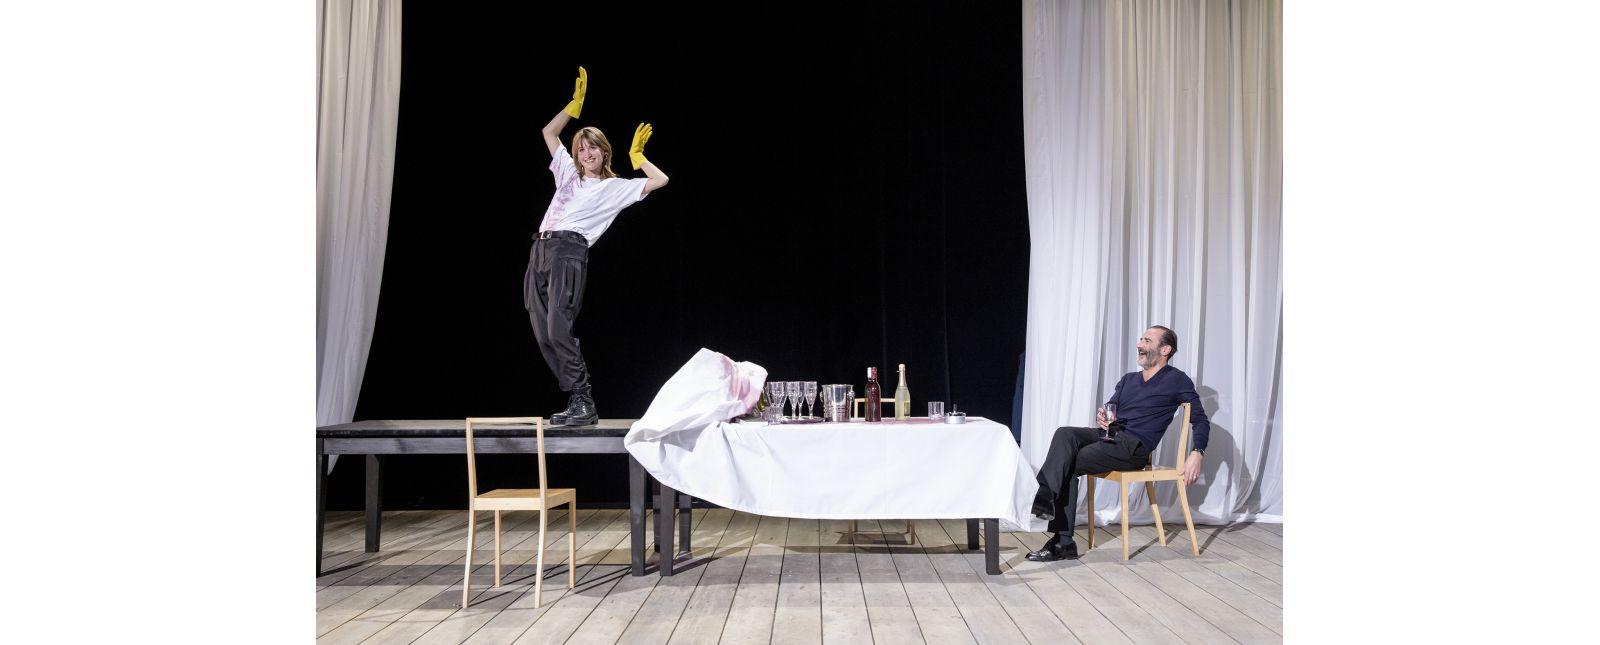 Der Riss durch die Welt // Laura Friedmann / Henry Meyer // 2020 // Rainer Muranyi